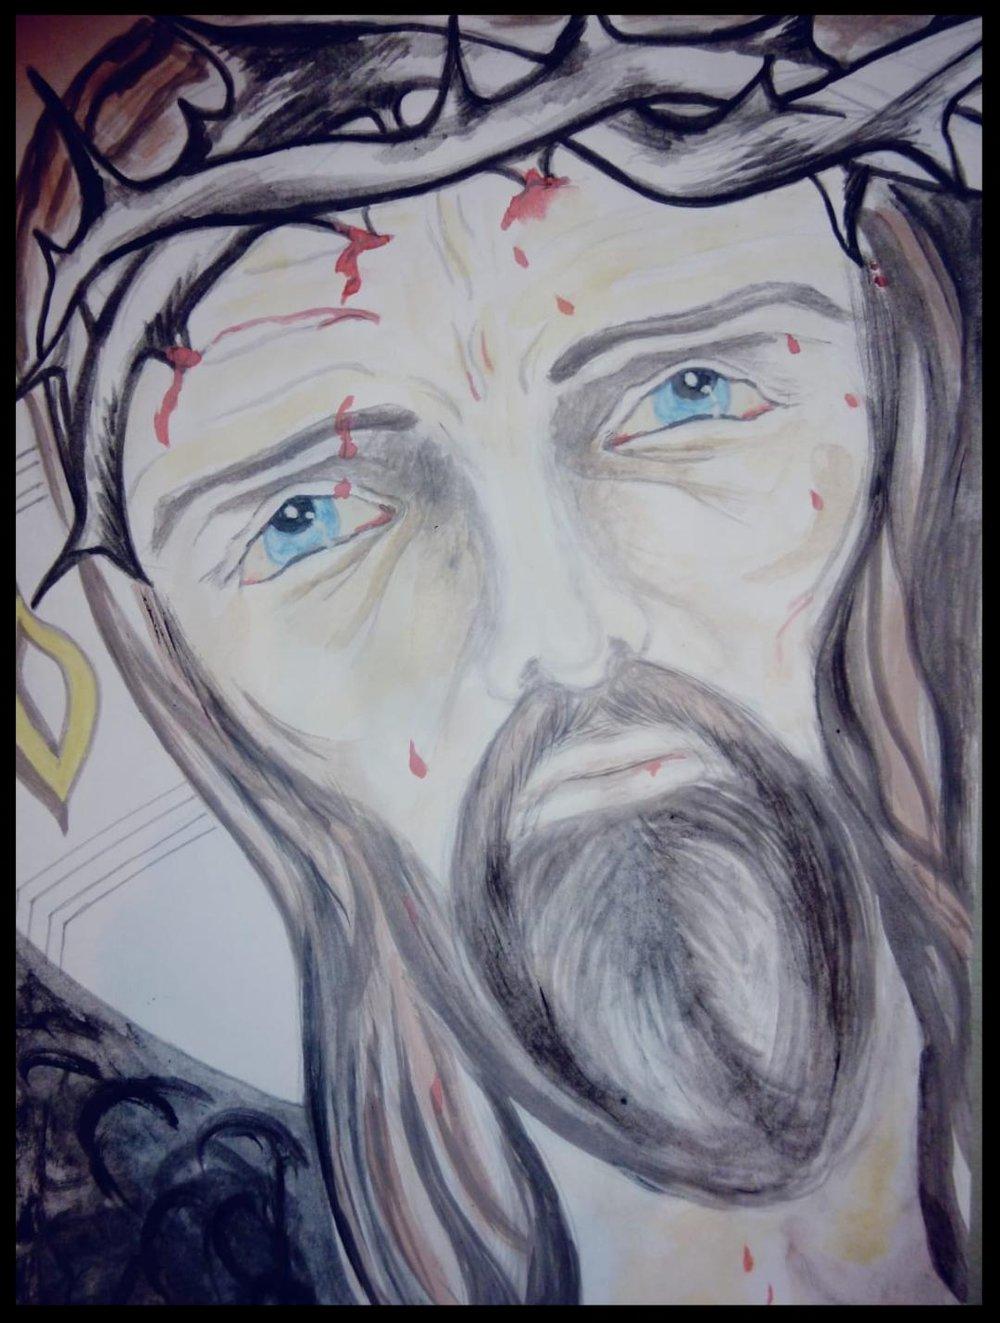 - JESUS IN PAINWATERCOLOR AND PENCIL30 CM X 22 CM